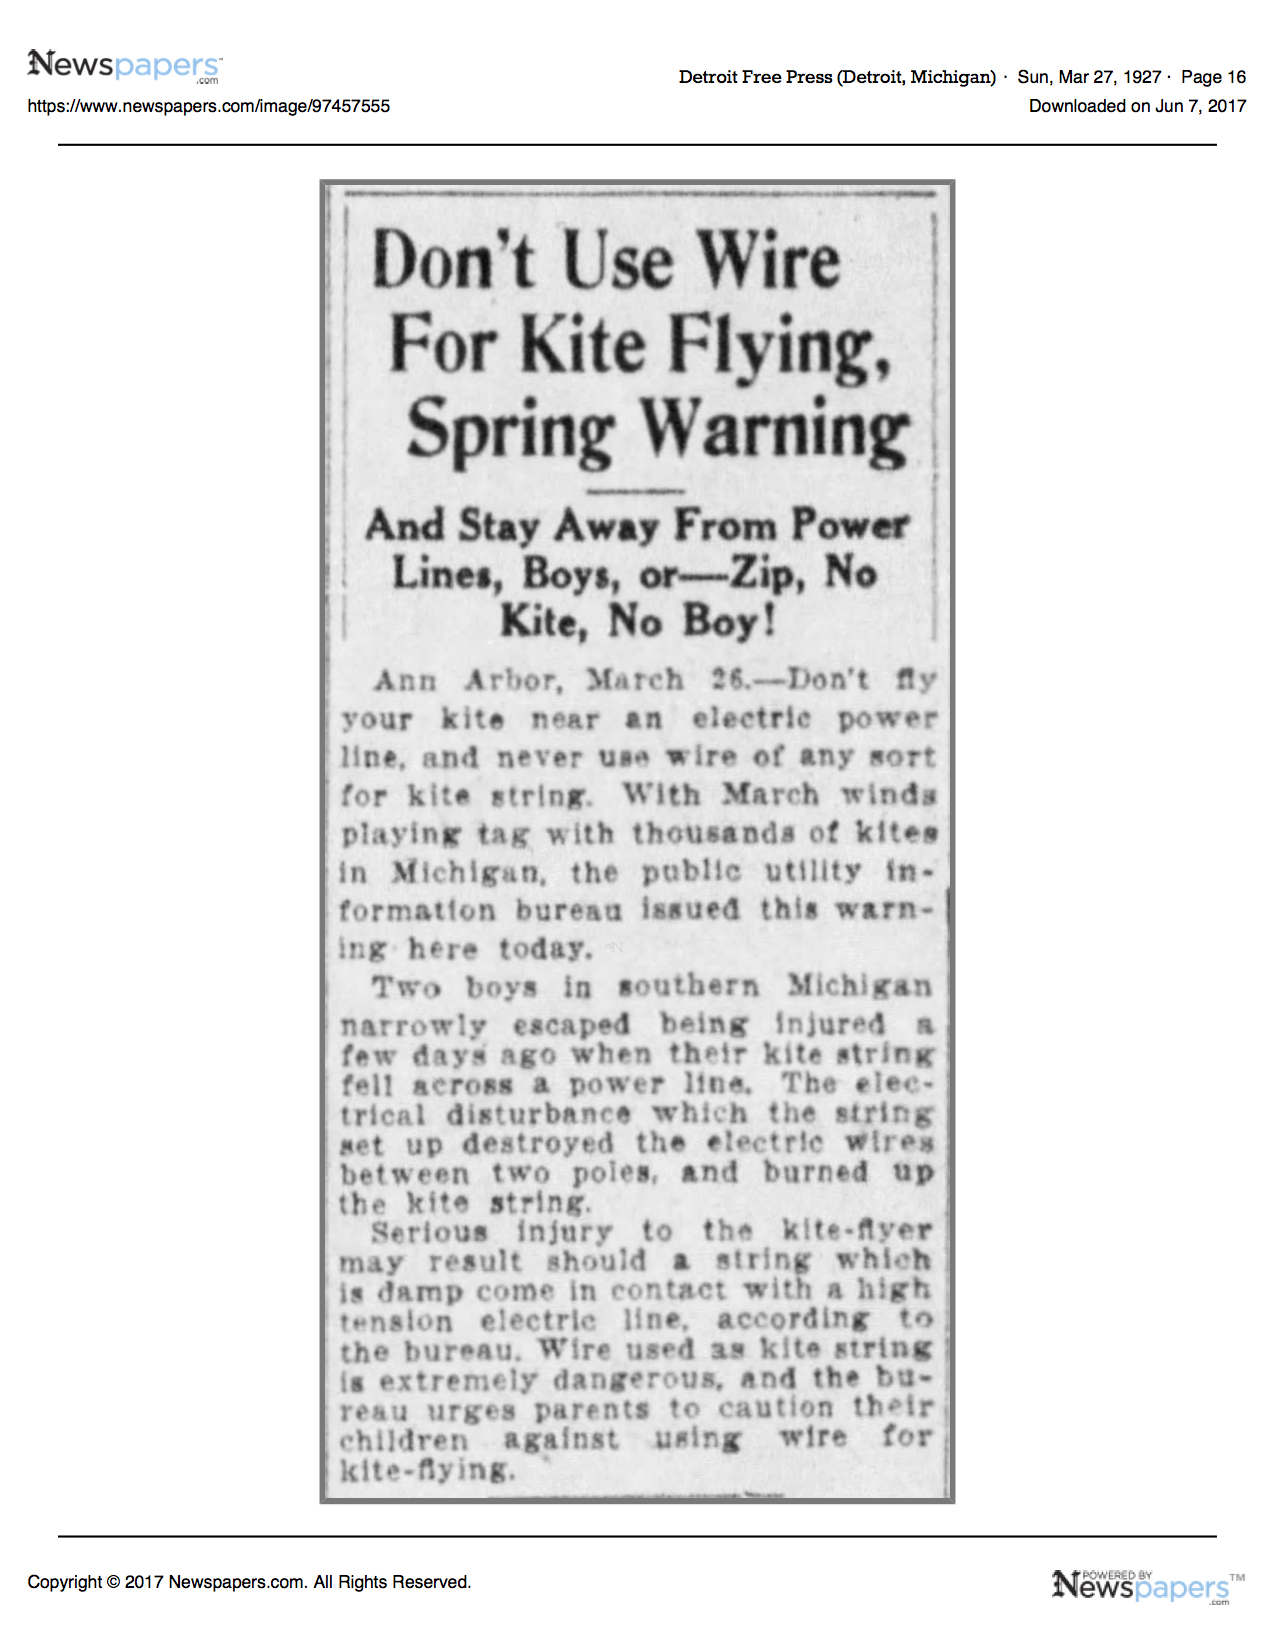 Detroit_Free_Press_Sun__Mar_27__1927_.jpg